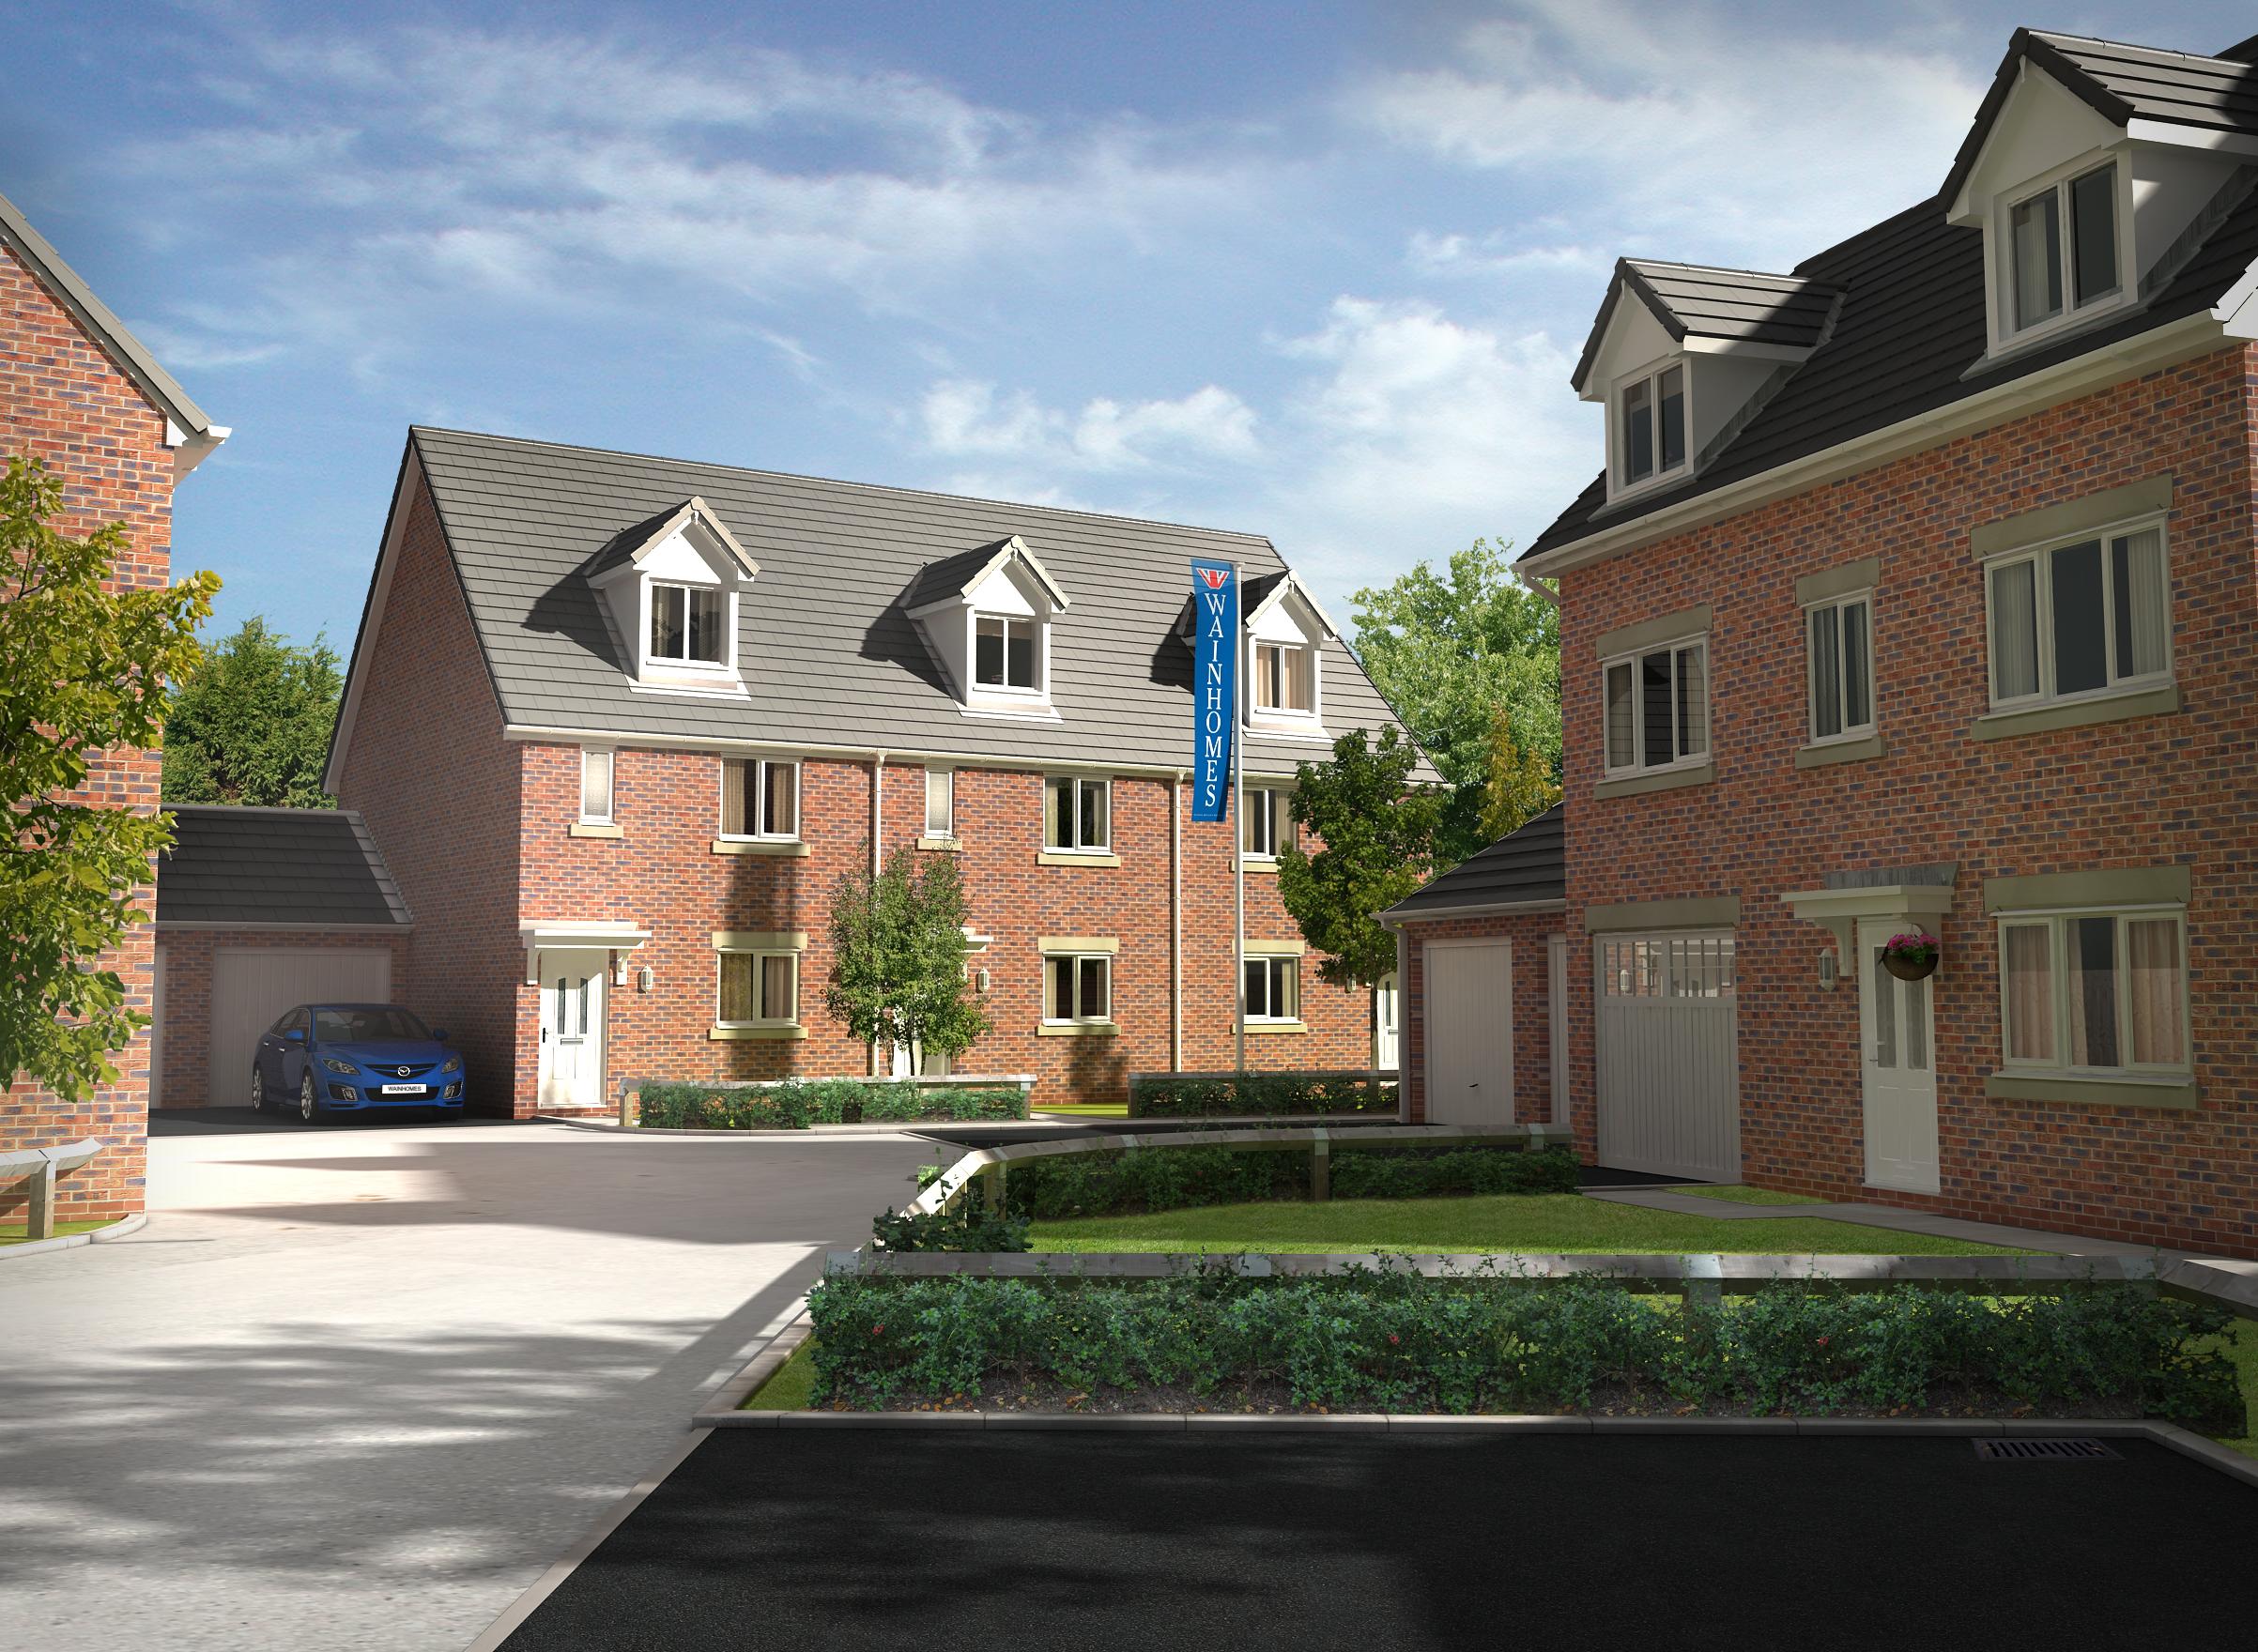 Housing CGIs